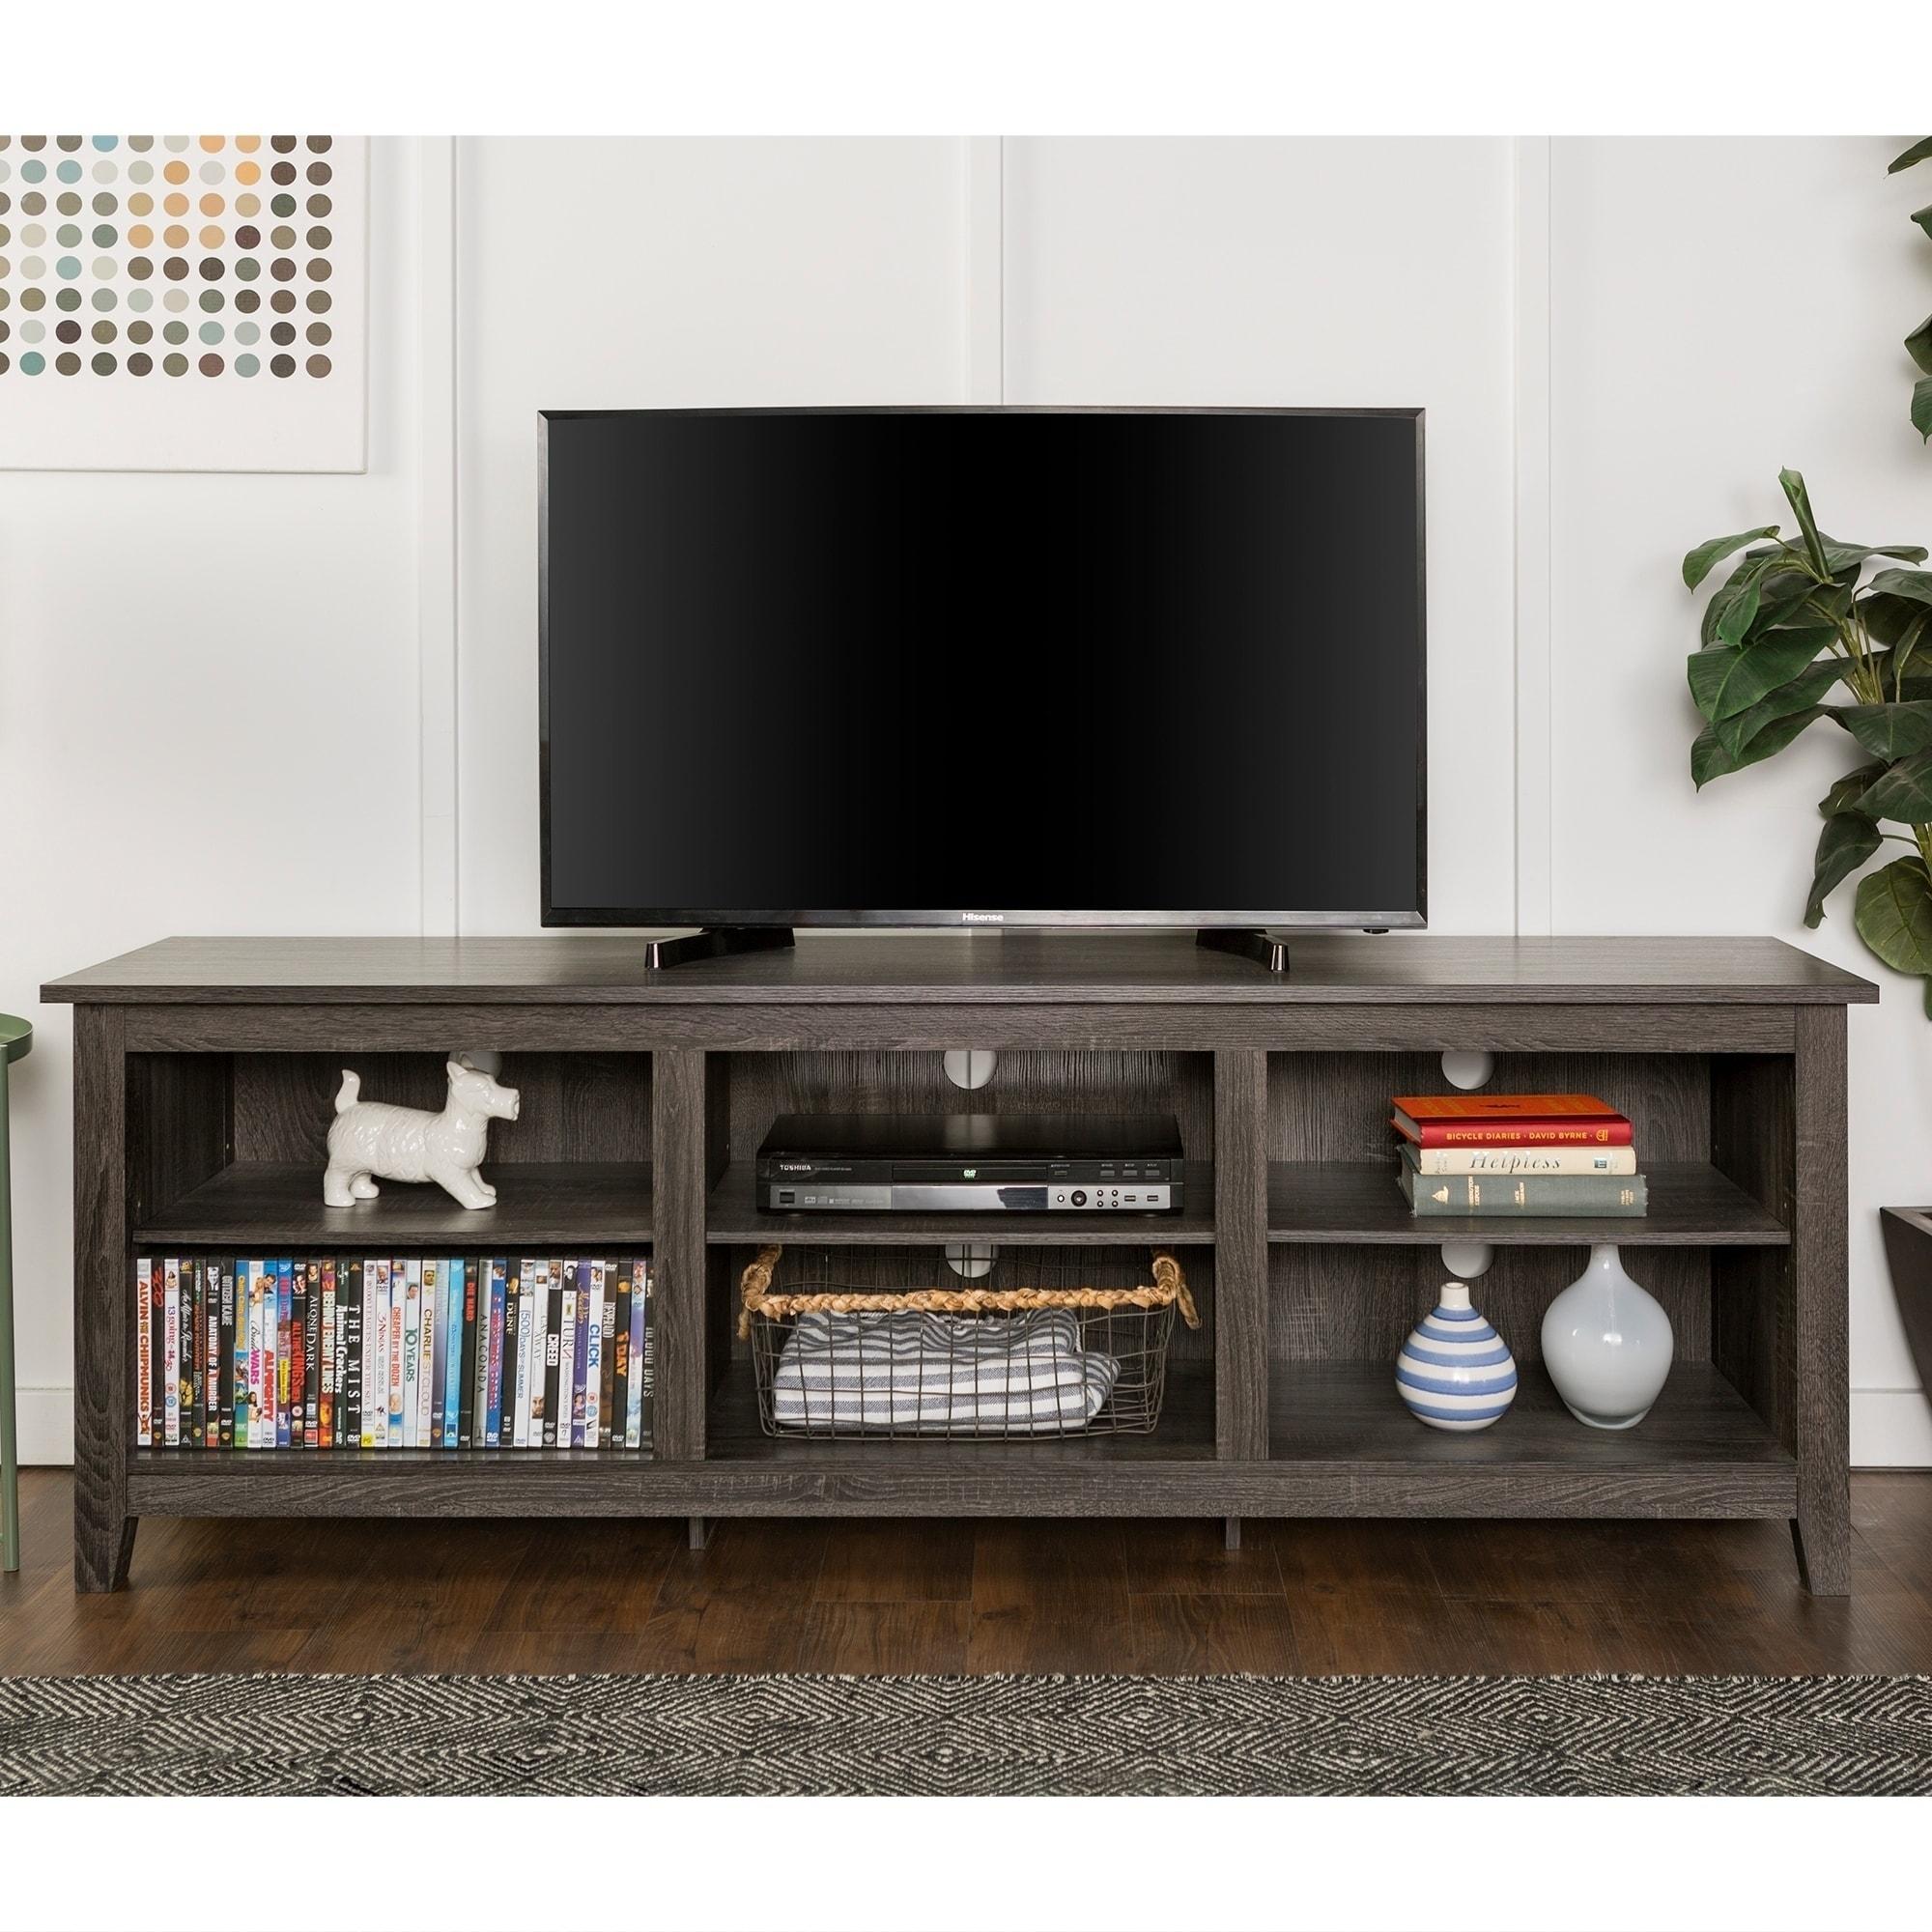 Shop Copper Grove Beaverhead 70 Inch Wood Media Tv Stand Charcoal